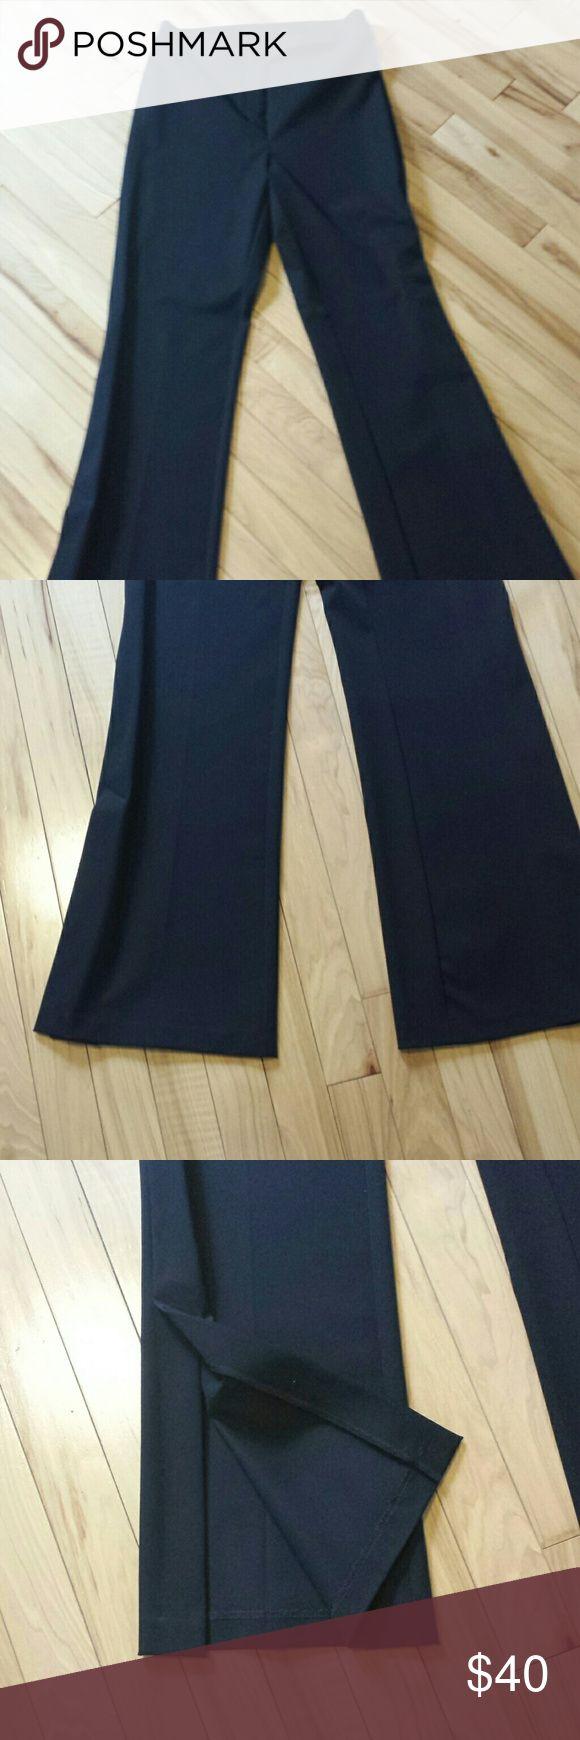 Laundry dress pants with side slit Laundry dress pants with side slit Pants